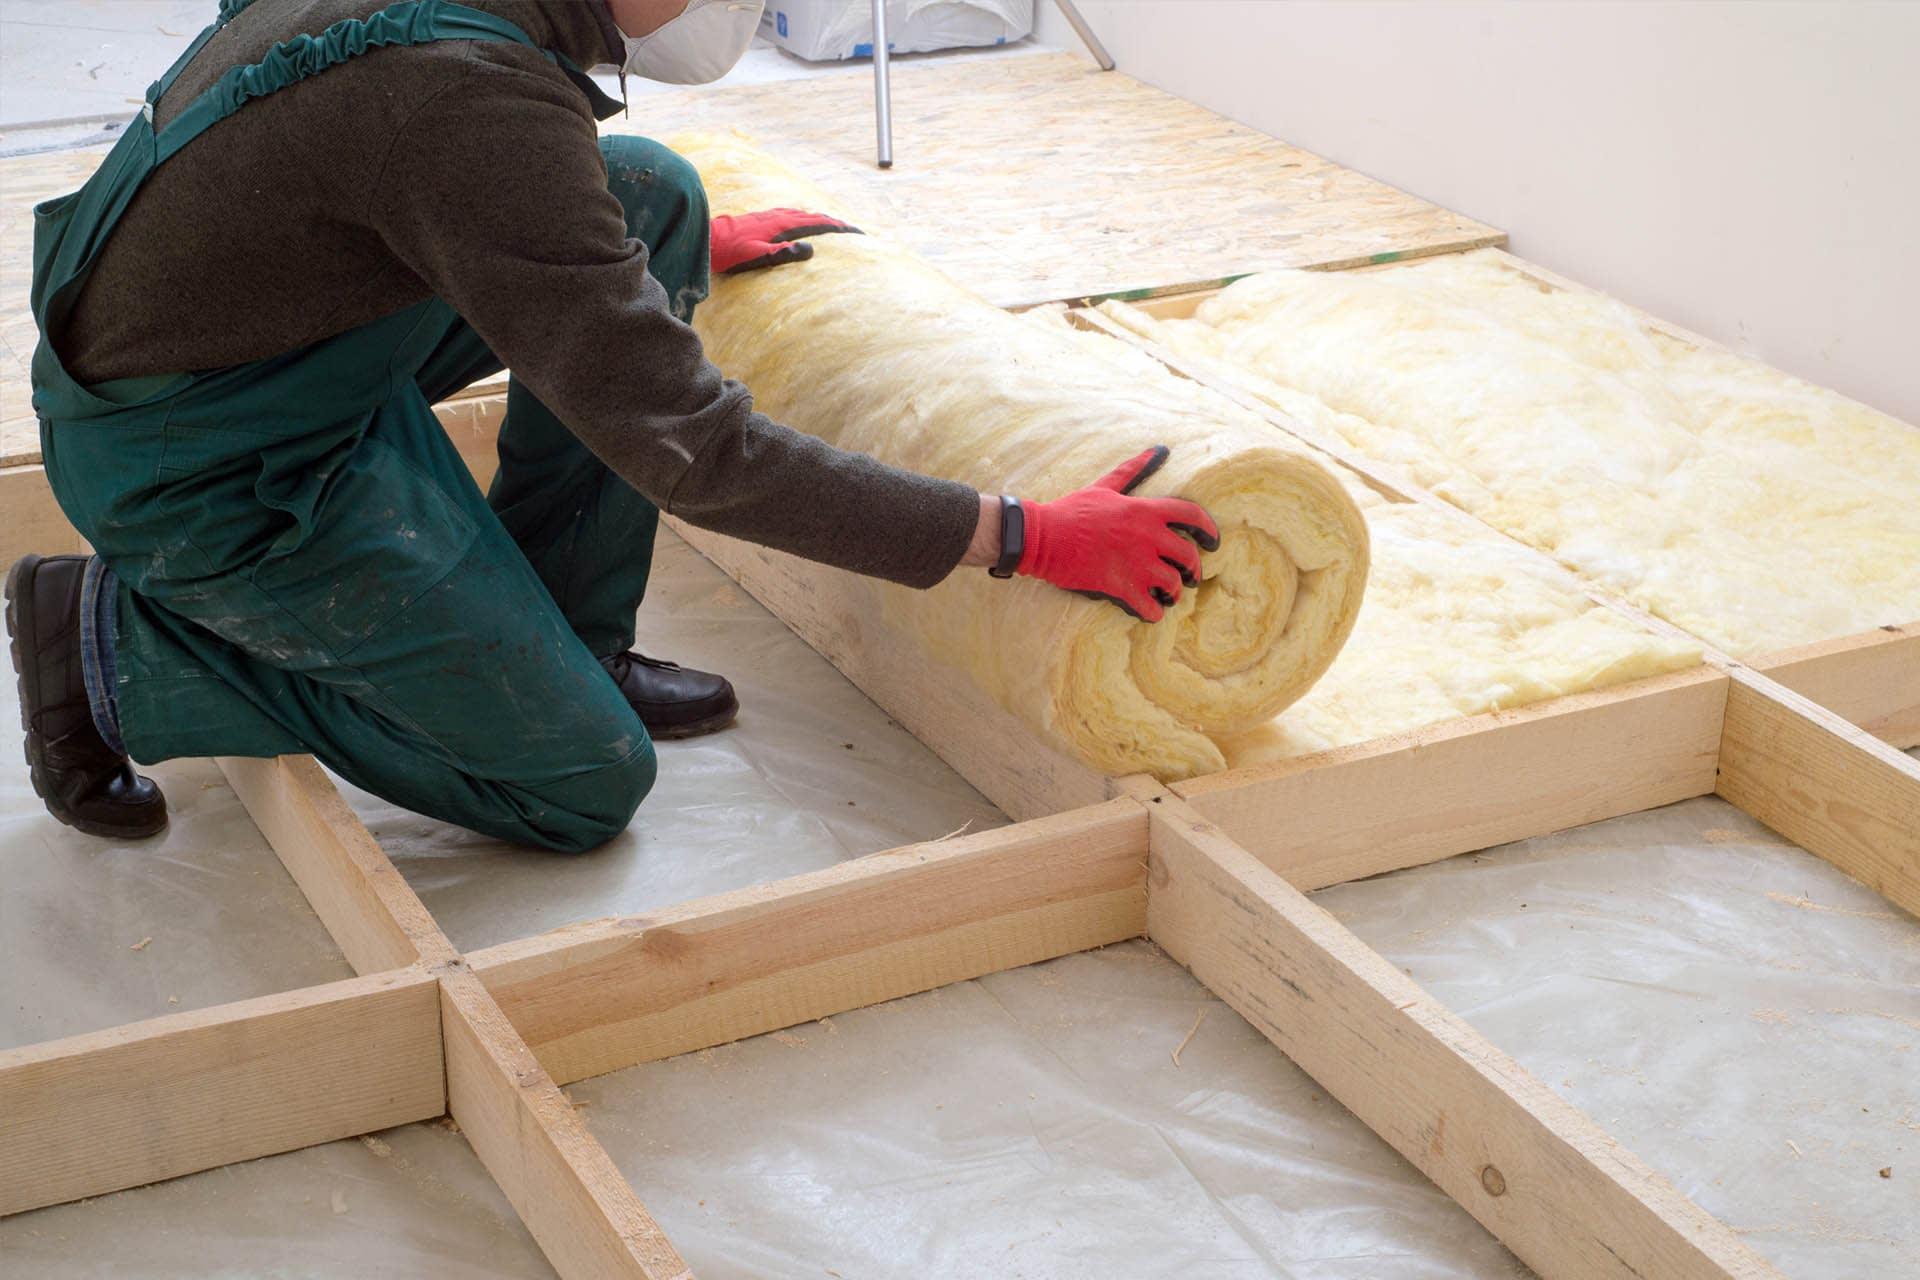 thermal-insulation-wool-rolls-on-floor-installation-building-materials